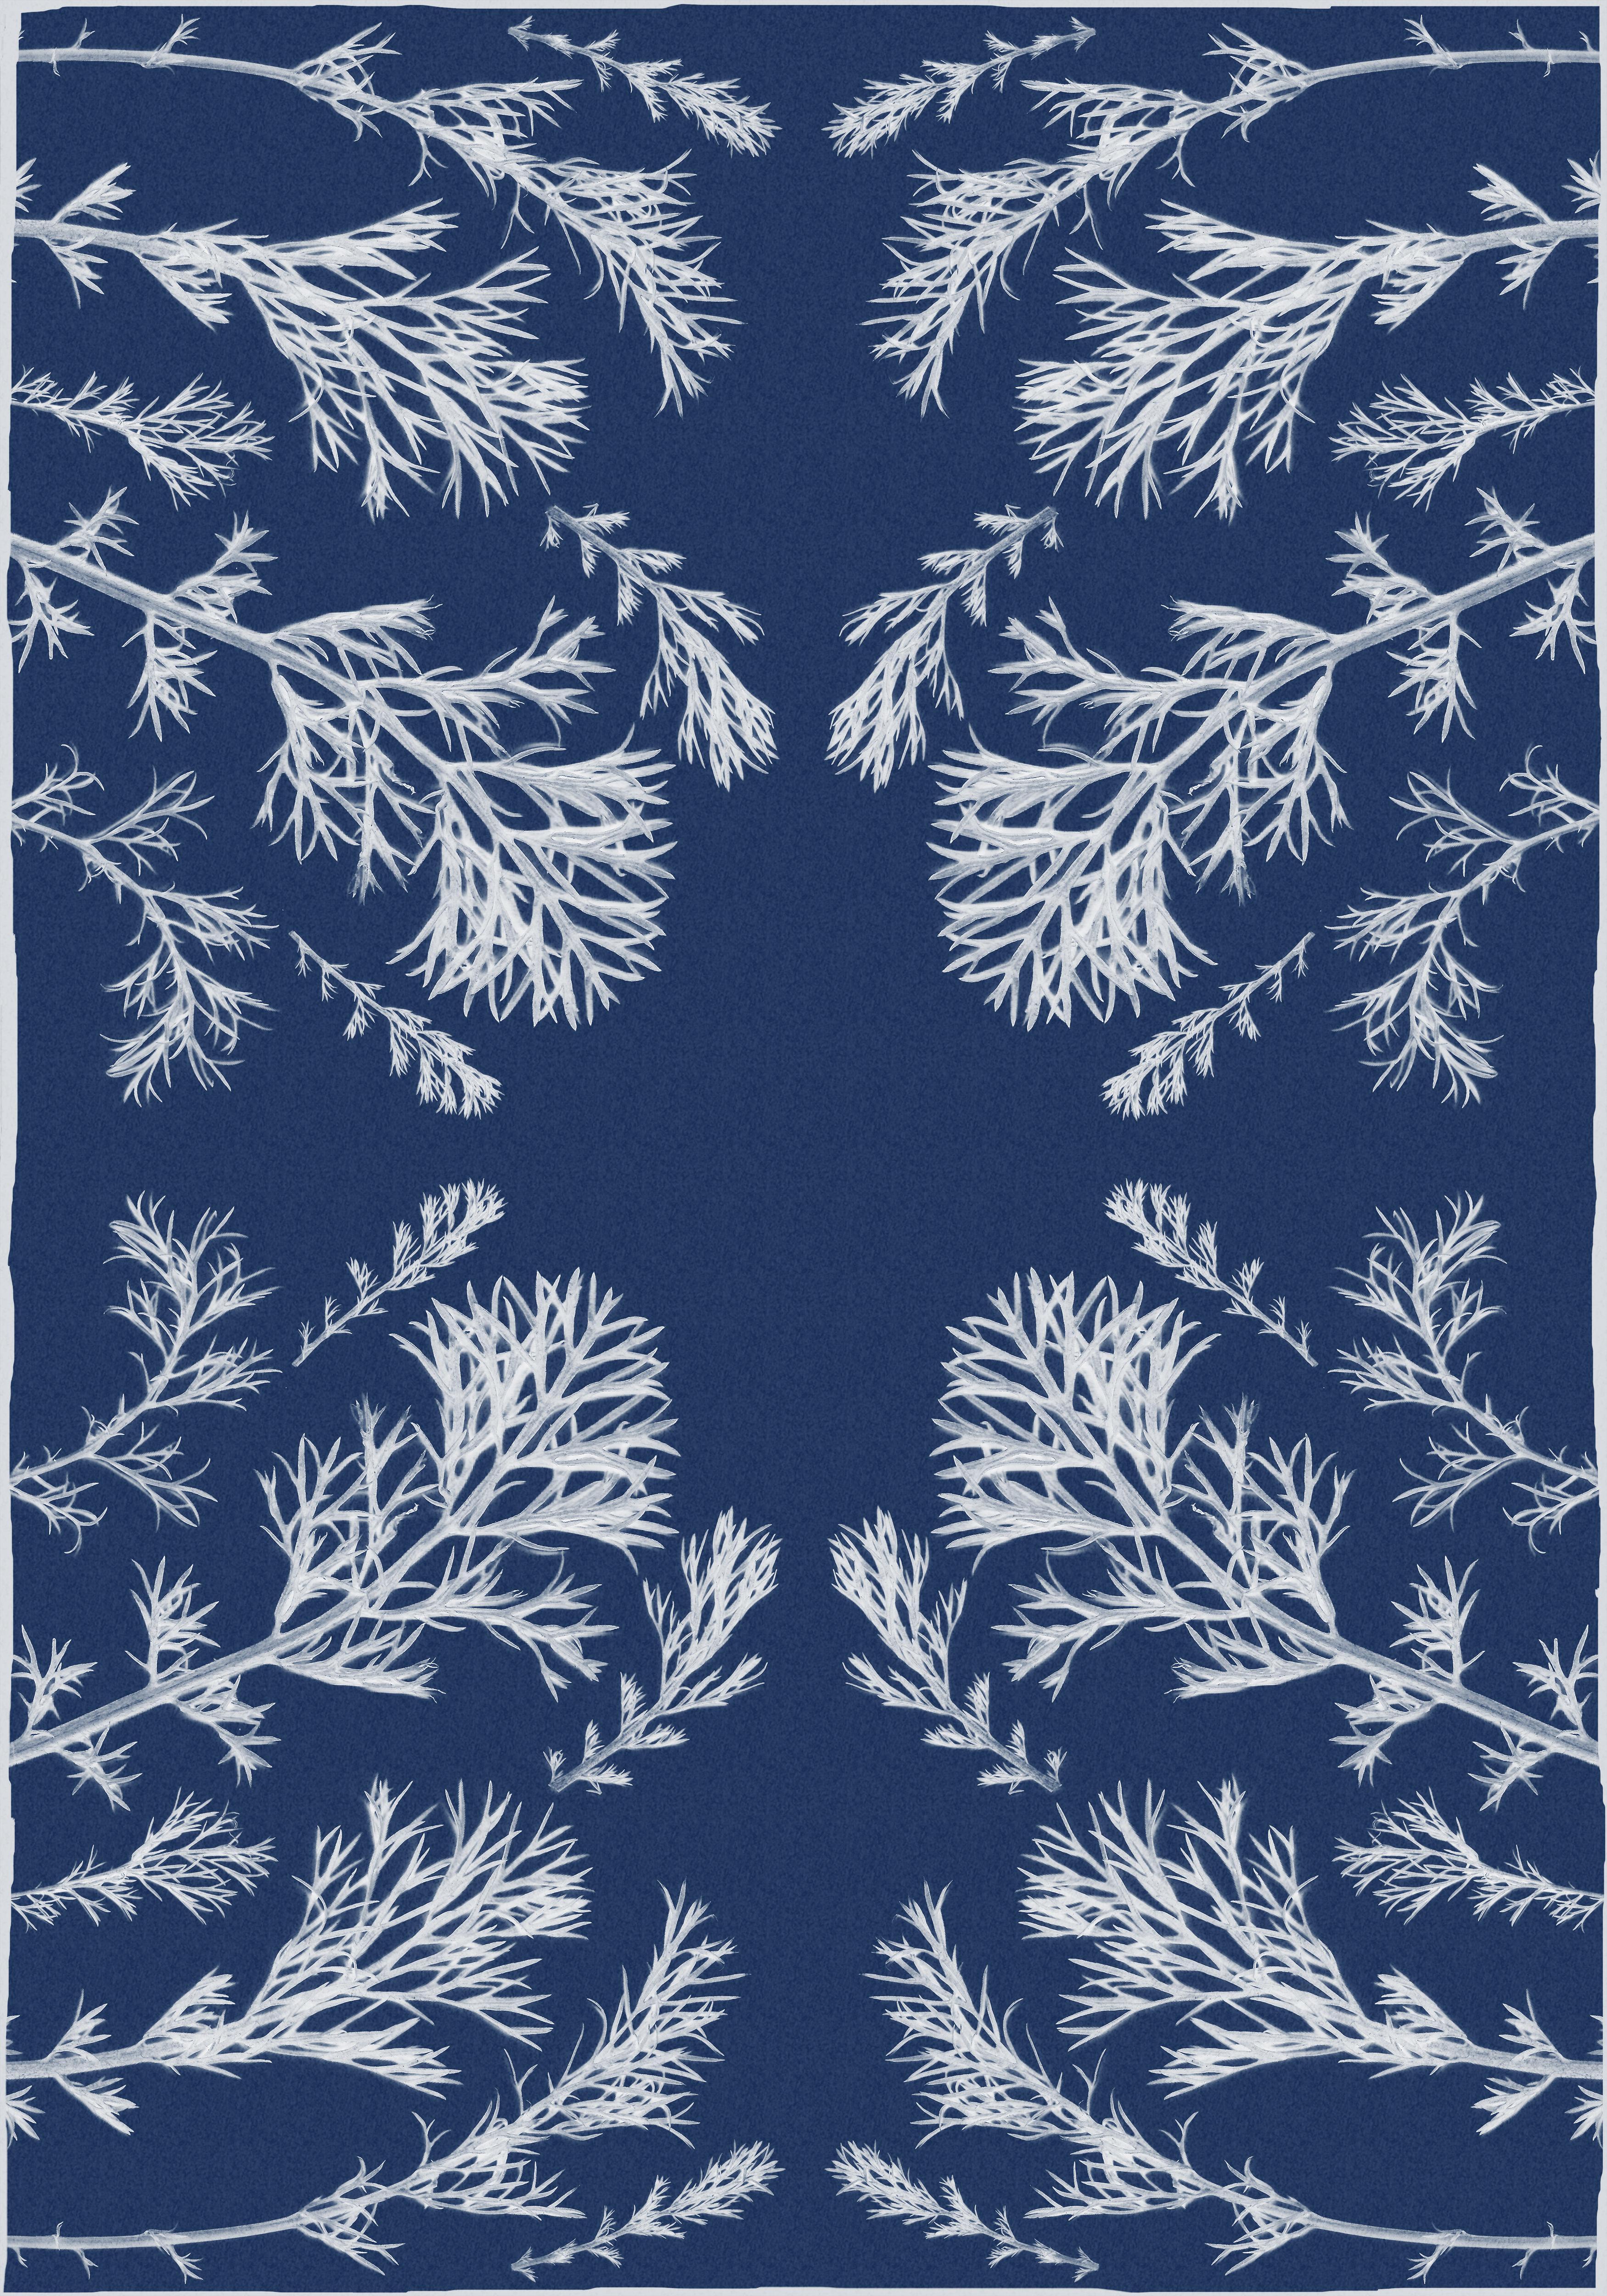 Classic Botanical Cyanotype, Handmade Using Natural Sunlight, Limited Edition